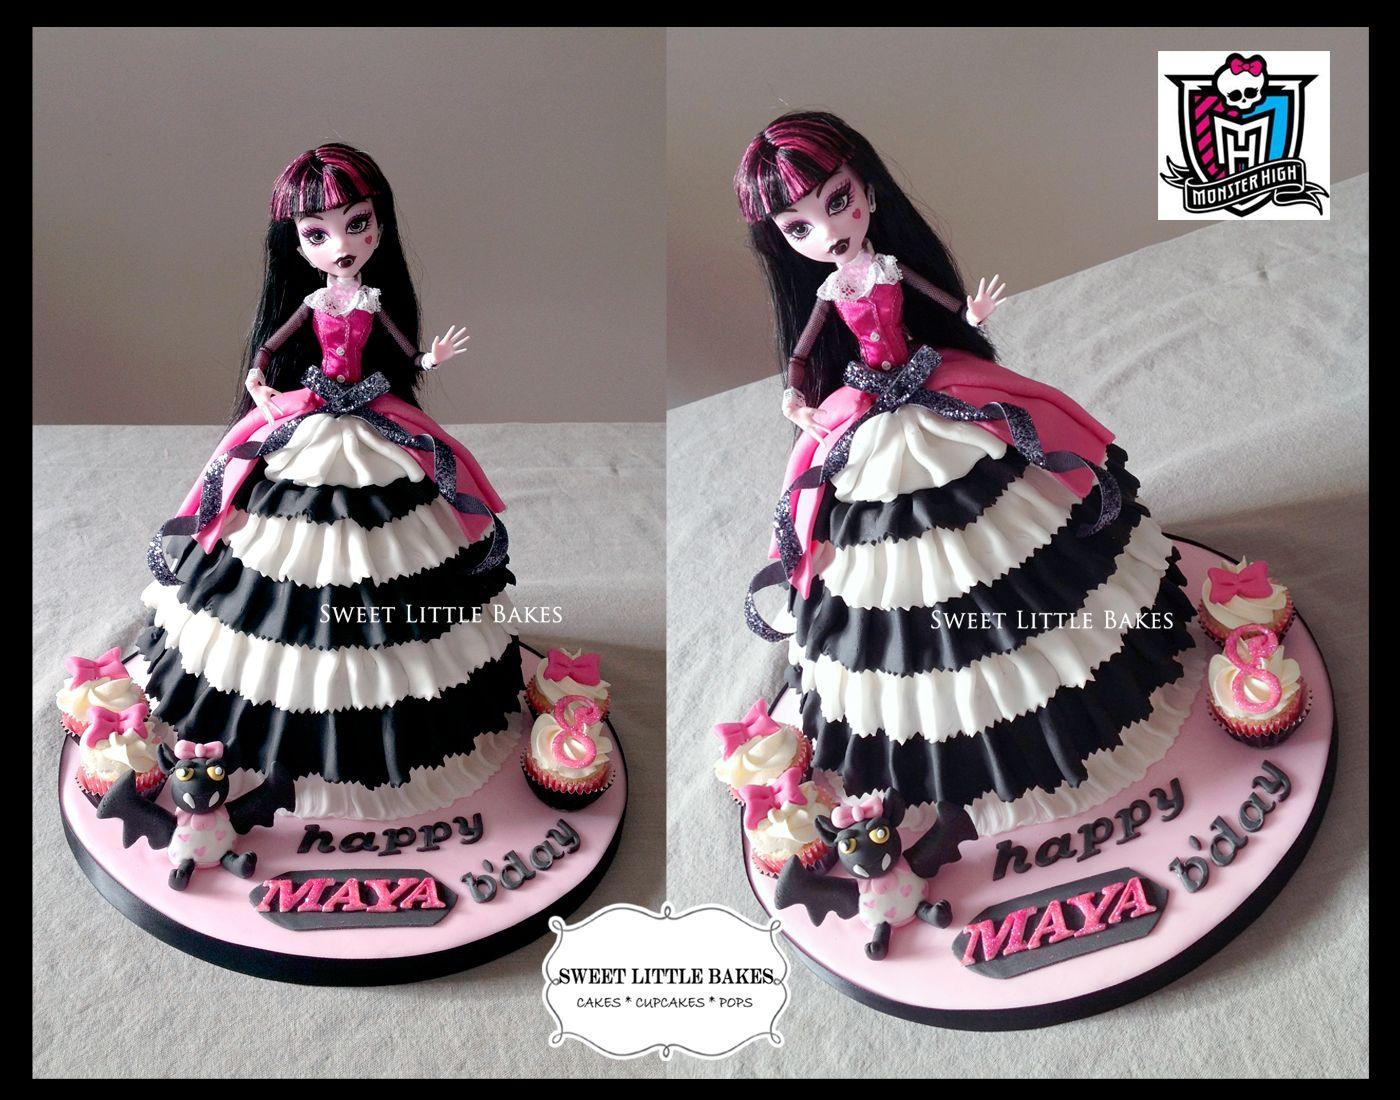 Magnificent My Cake Monsterhigh Dollcake Draculaura Monster High Personalised Birthday Cards Sponlily Jamesorg